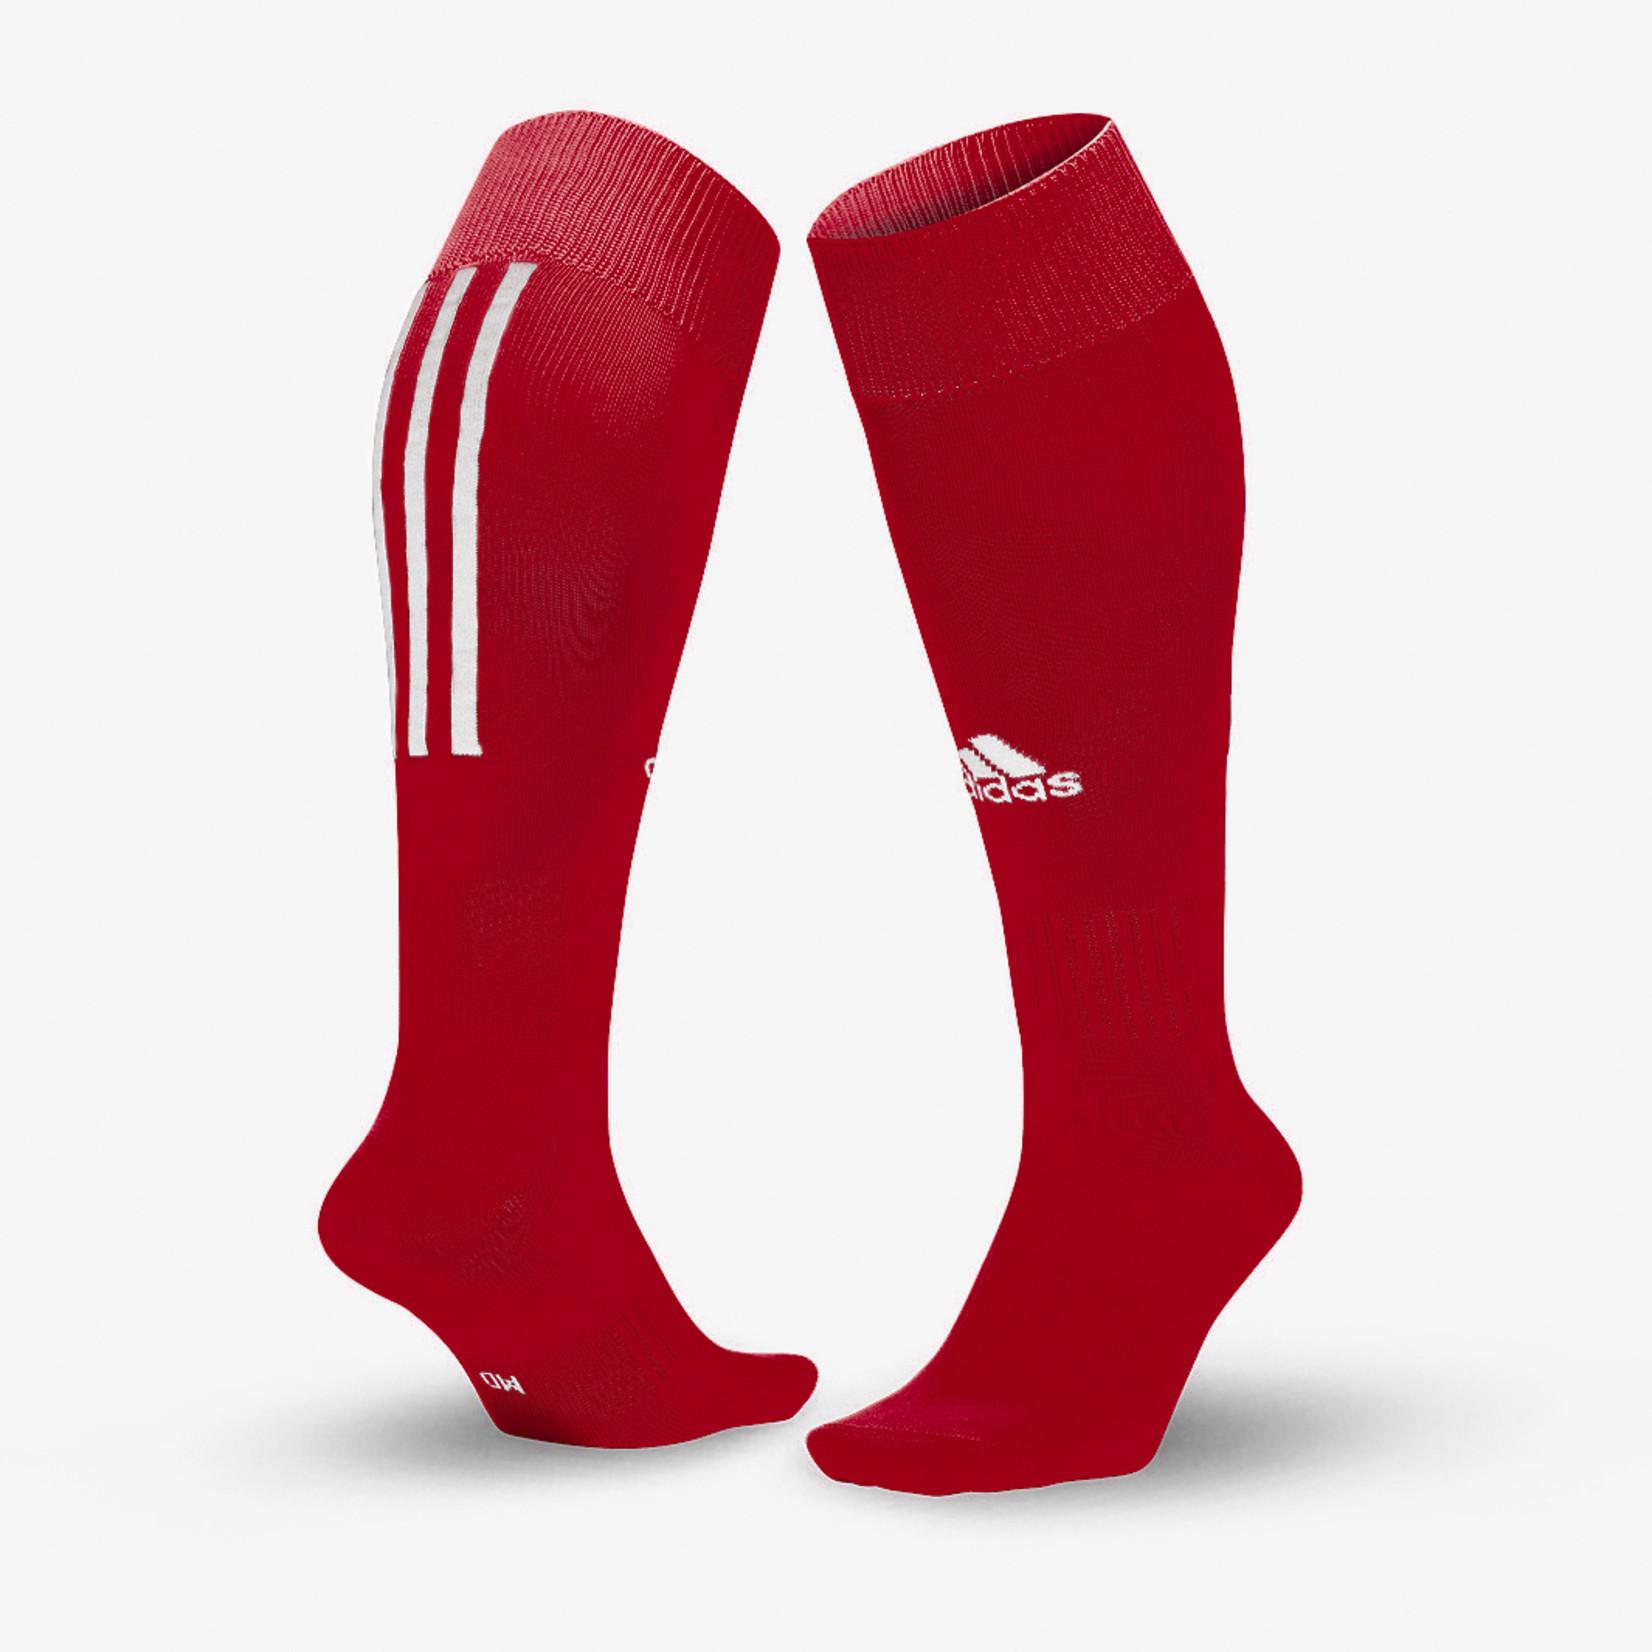 Adidas Adidas Soccer Socks, Santos 18